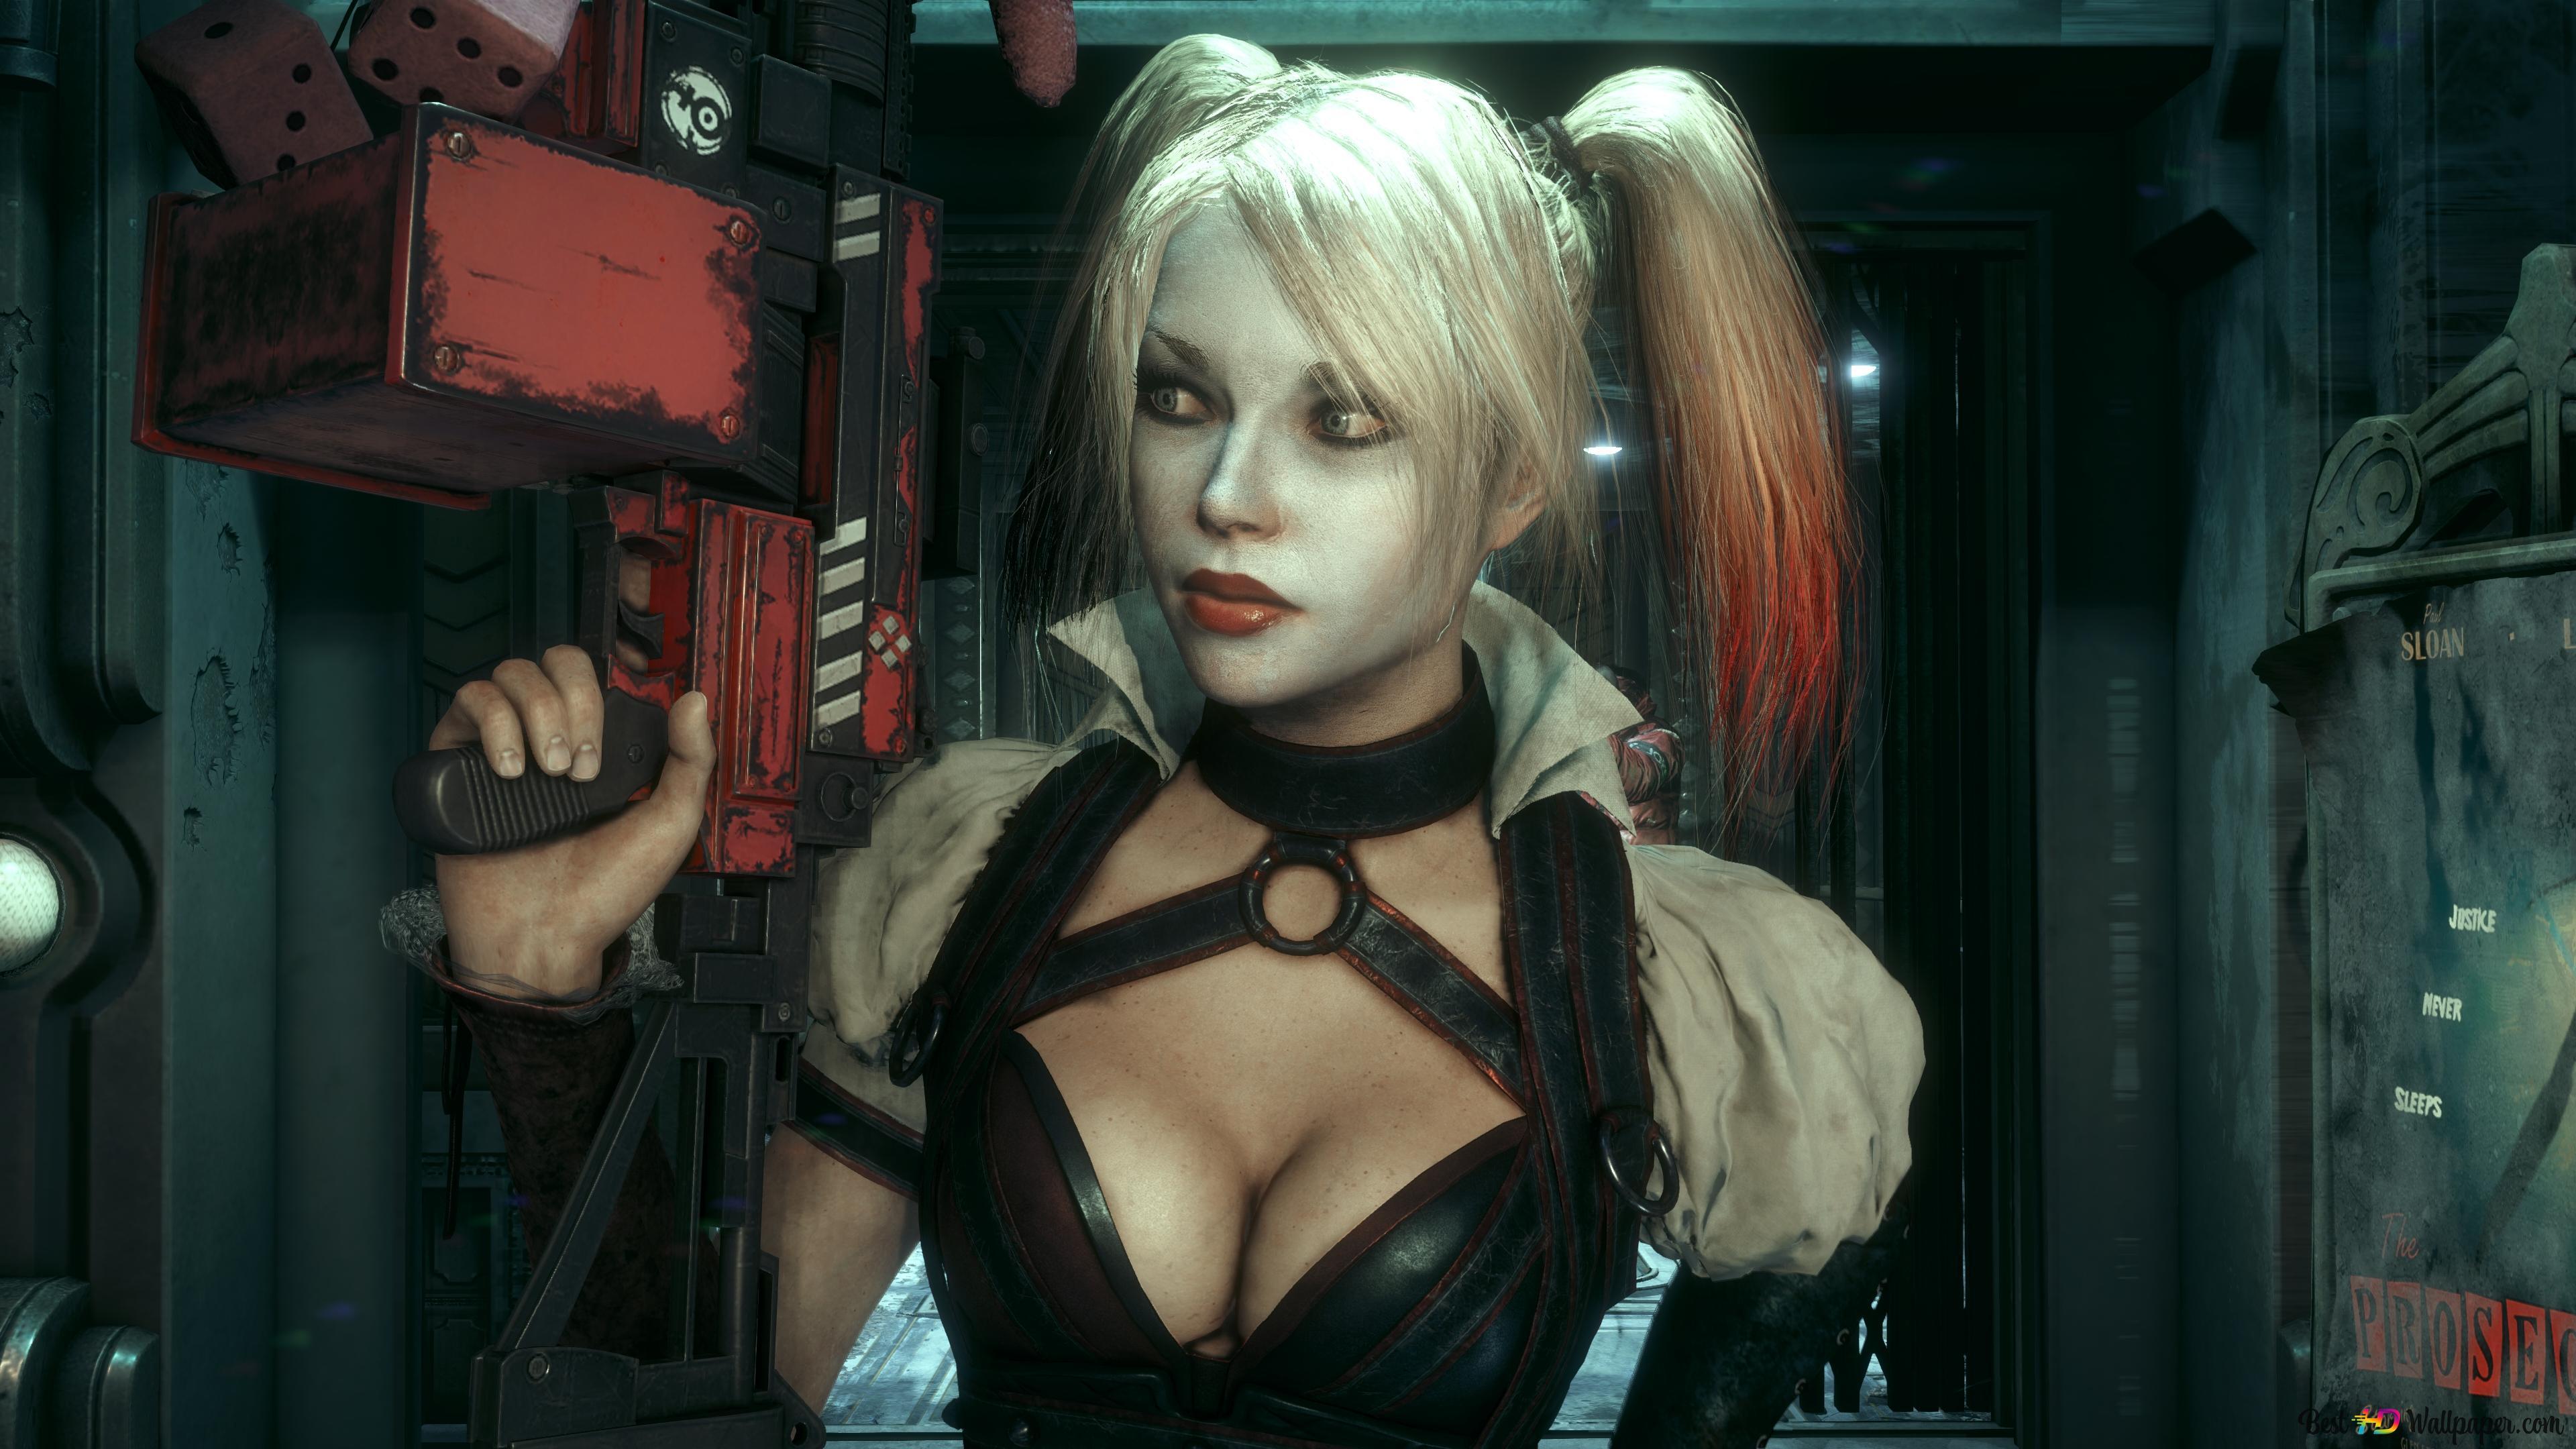 Batman Arkham Knight Harley Quinn Hd Wallpaper Download